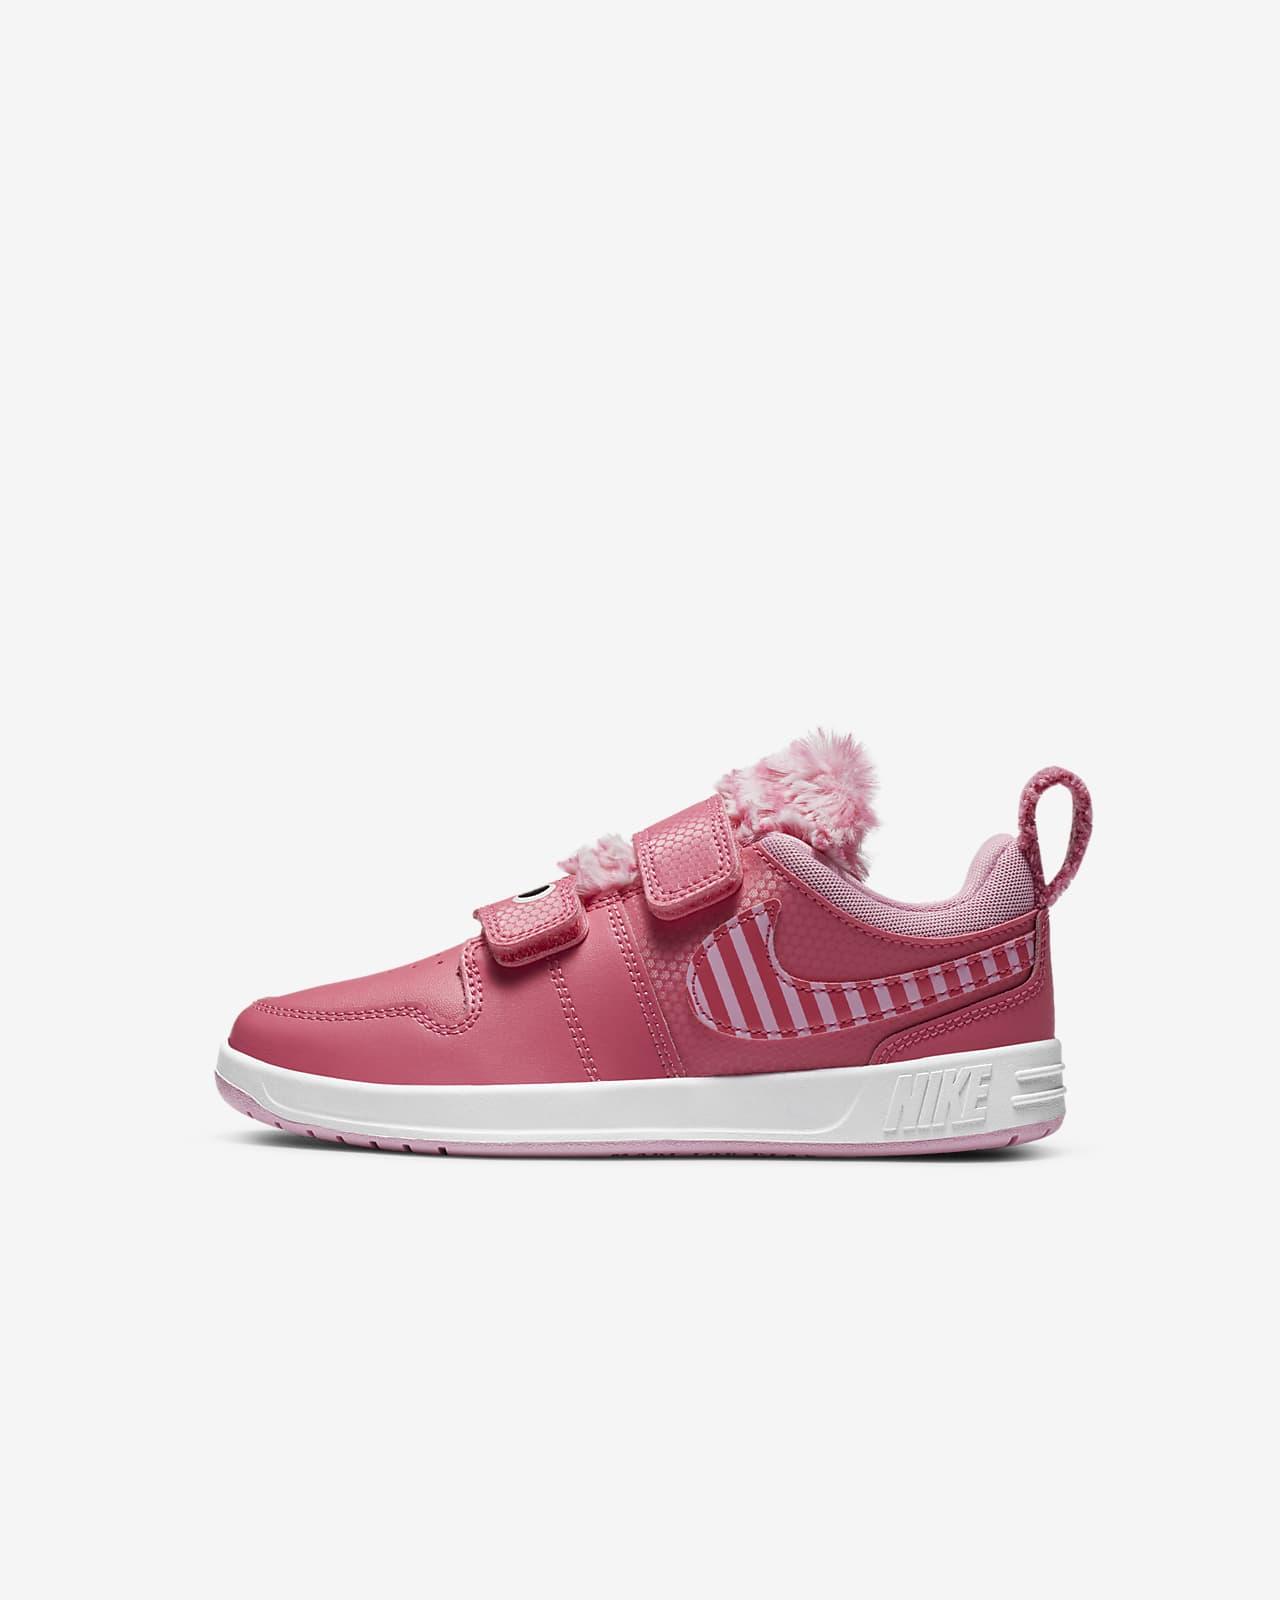 Calzado para niños talla pequeña Nike Pico 5 Fast n Furry